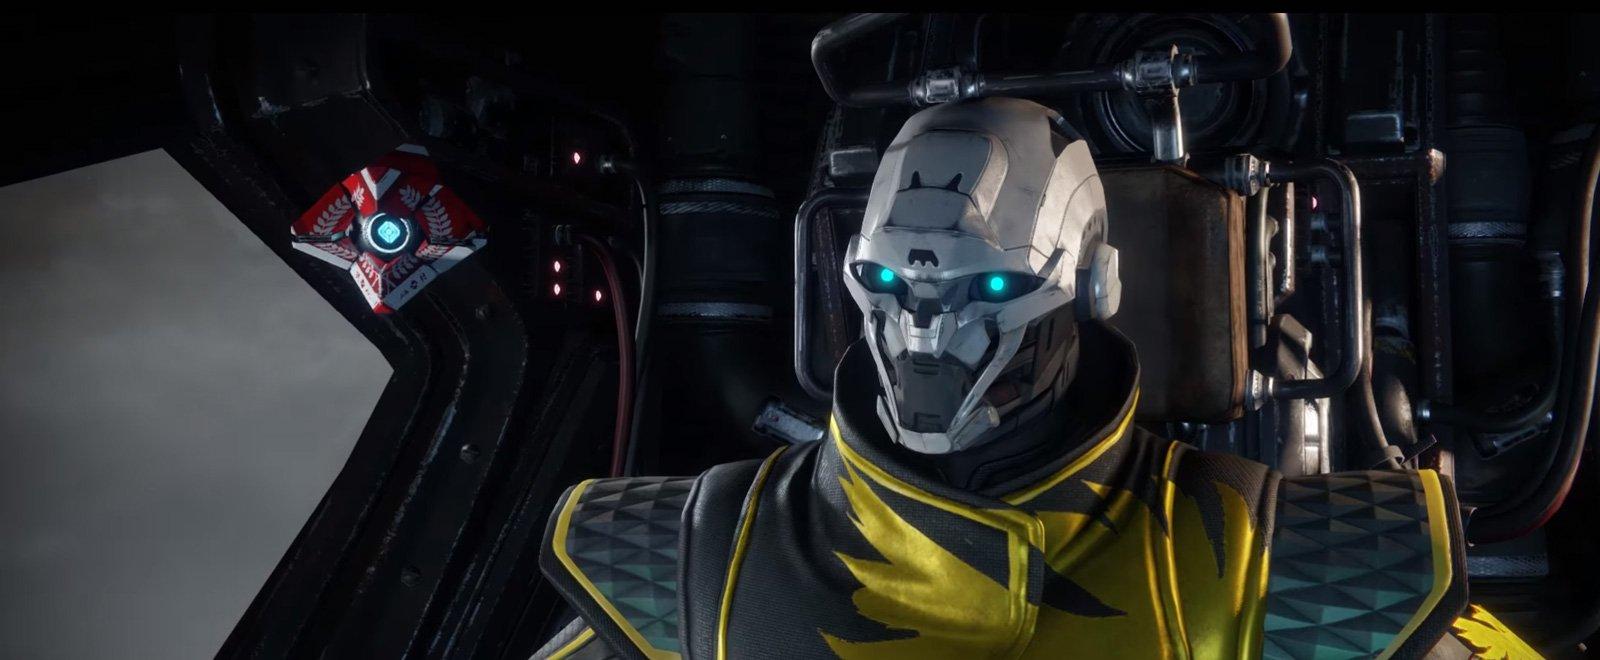 Destiny 2 Screenshot 19